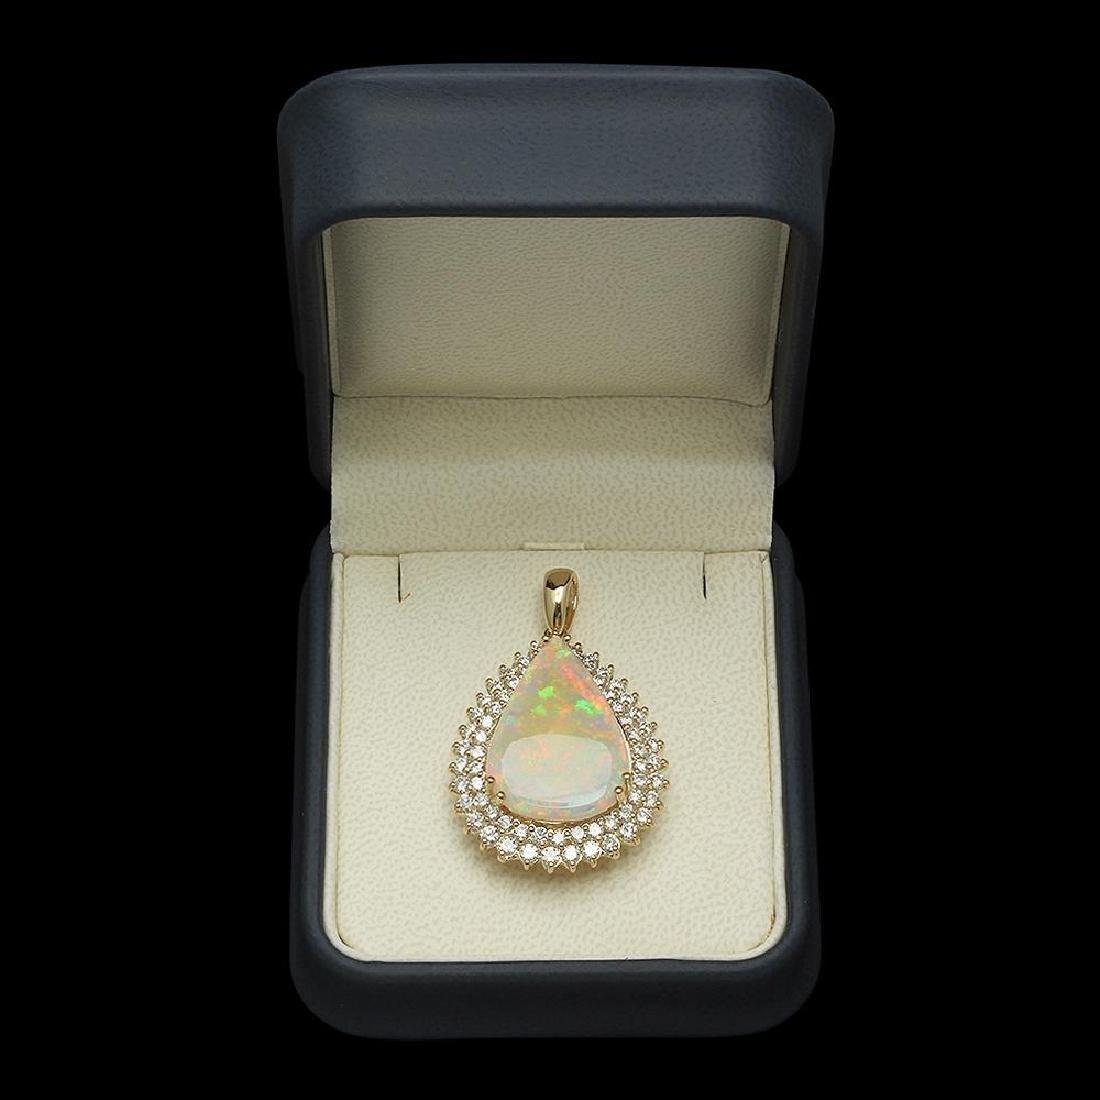 14K Gold 7.12ct Opal & 2.03ct Diamond Pendant - 3